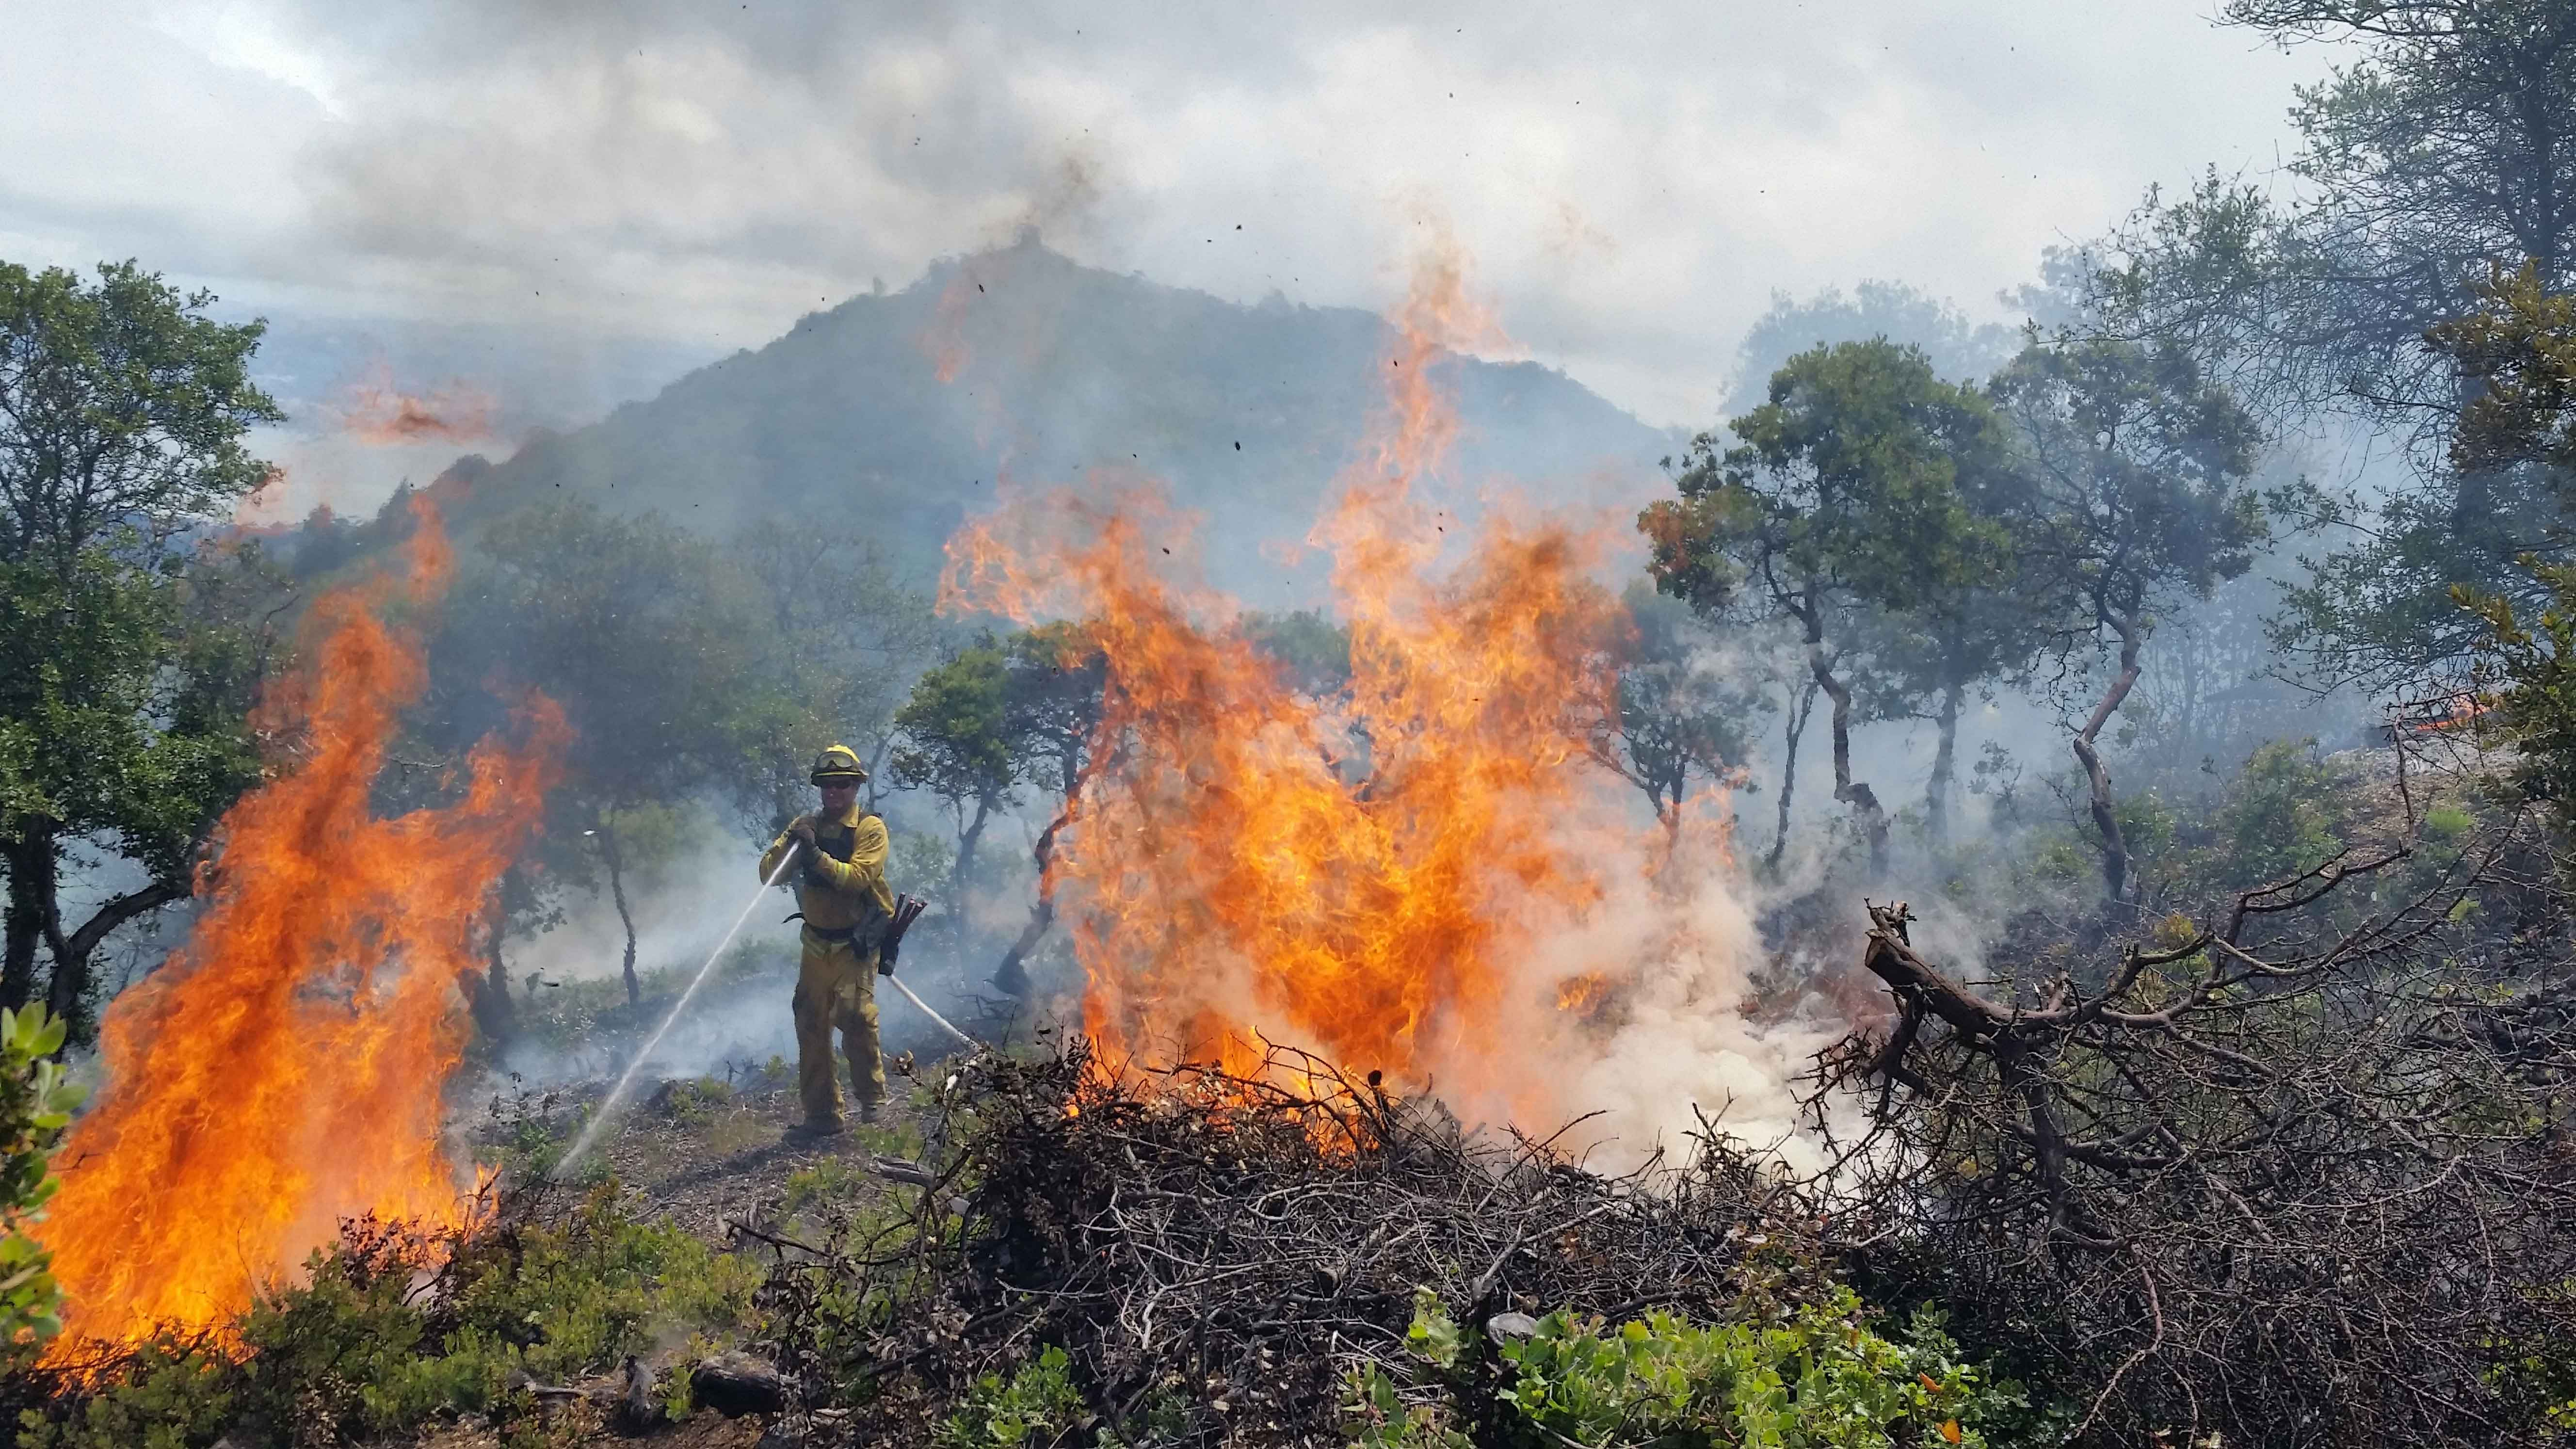 On Mt. Tam, a prescribed burn decreases fuel loads in chaparral and scrub oak communities.